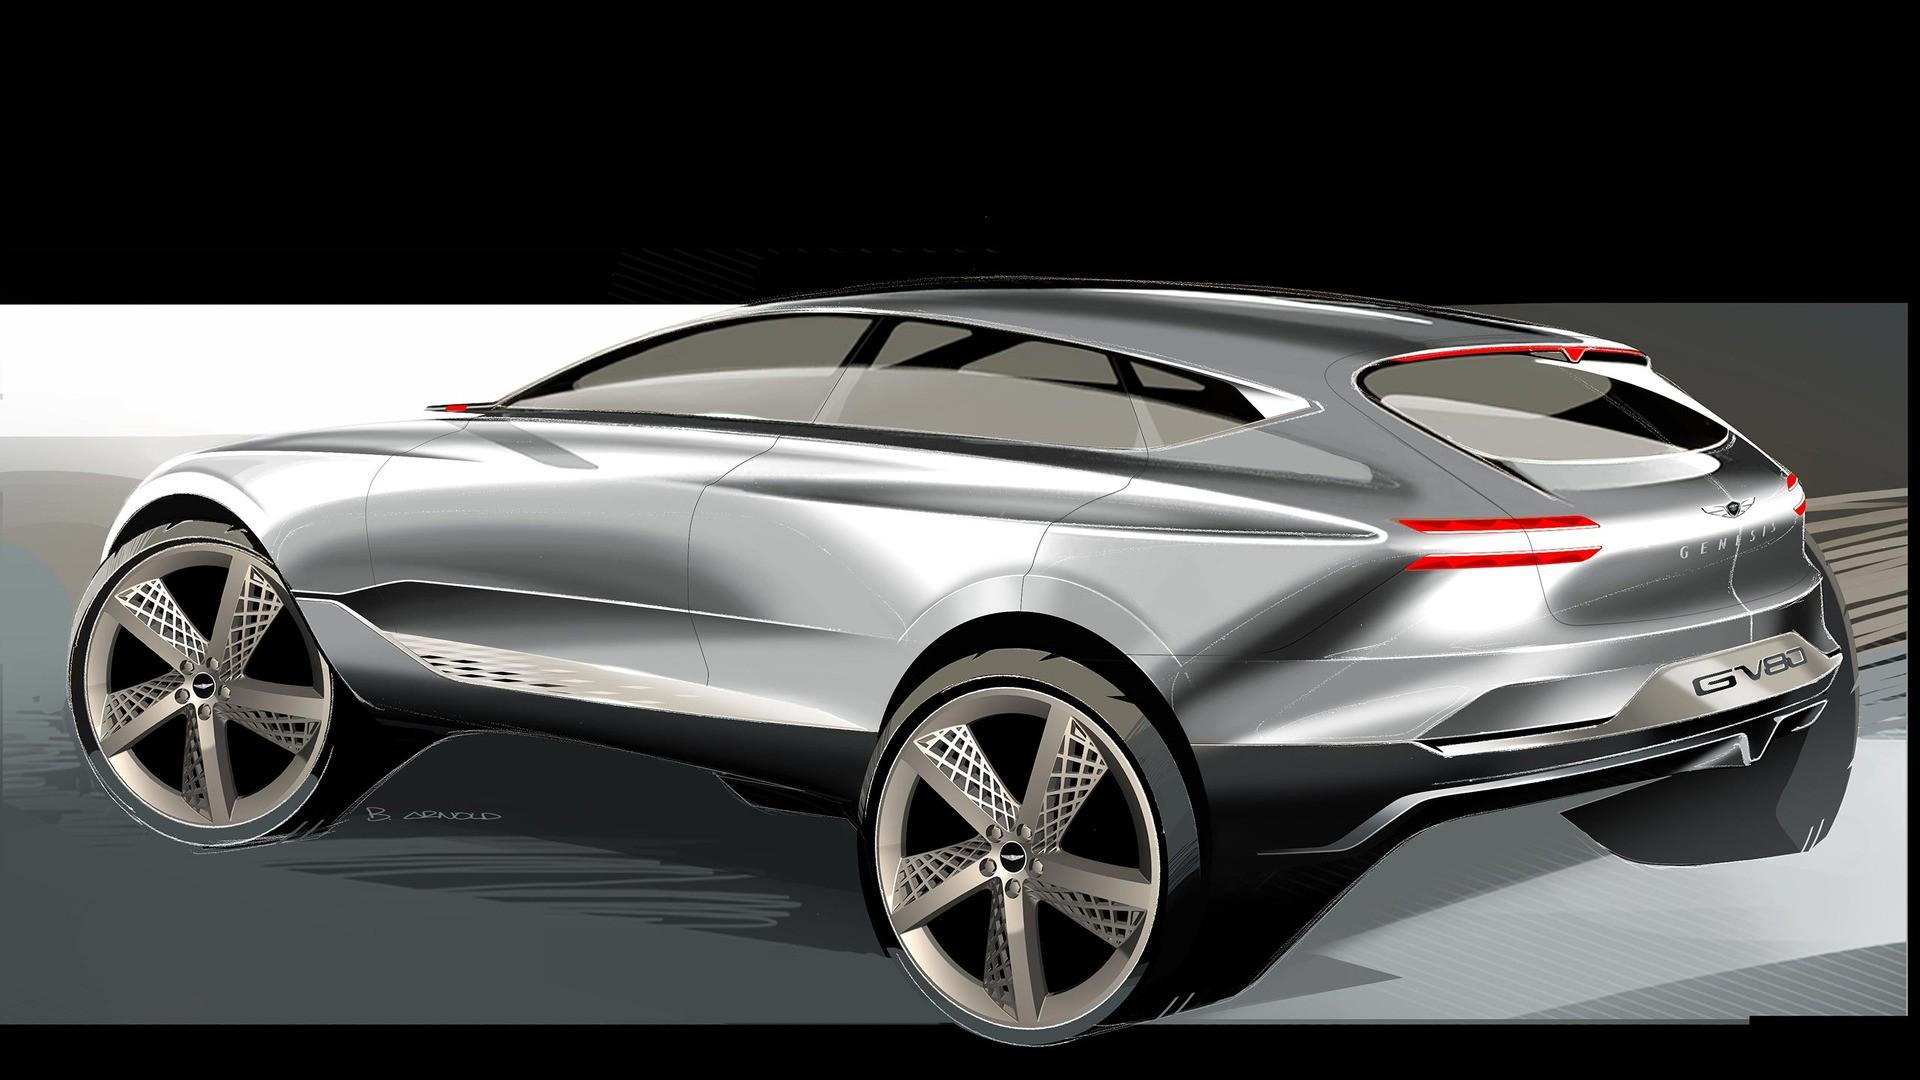 spyshots 2020 genesis gv80 suv testing to kickstart hyundai 39 s luxury crossover autoevolution. Black Bedroom Furniture Sets. Home Design Ideas